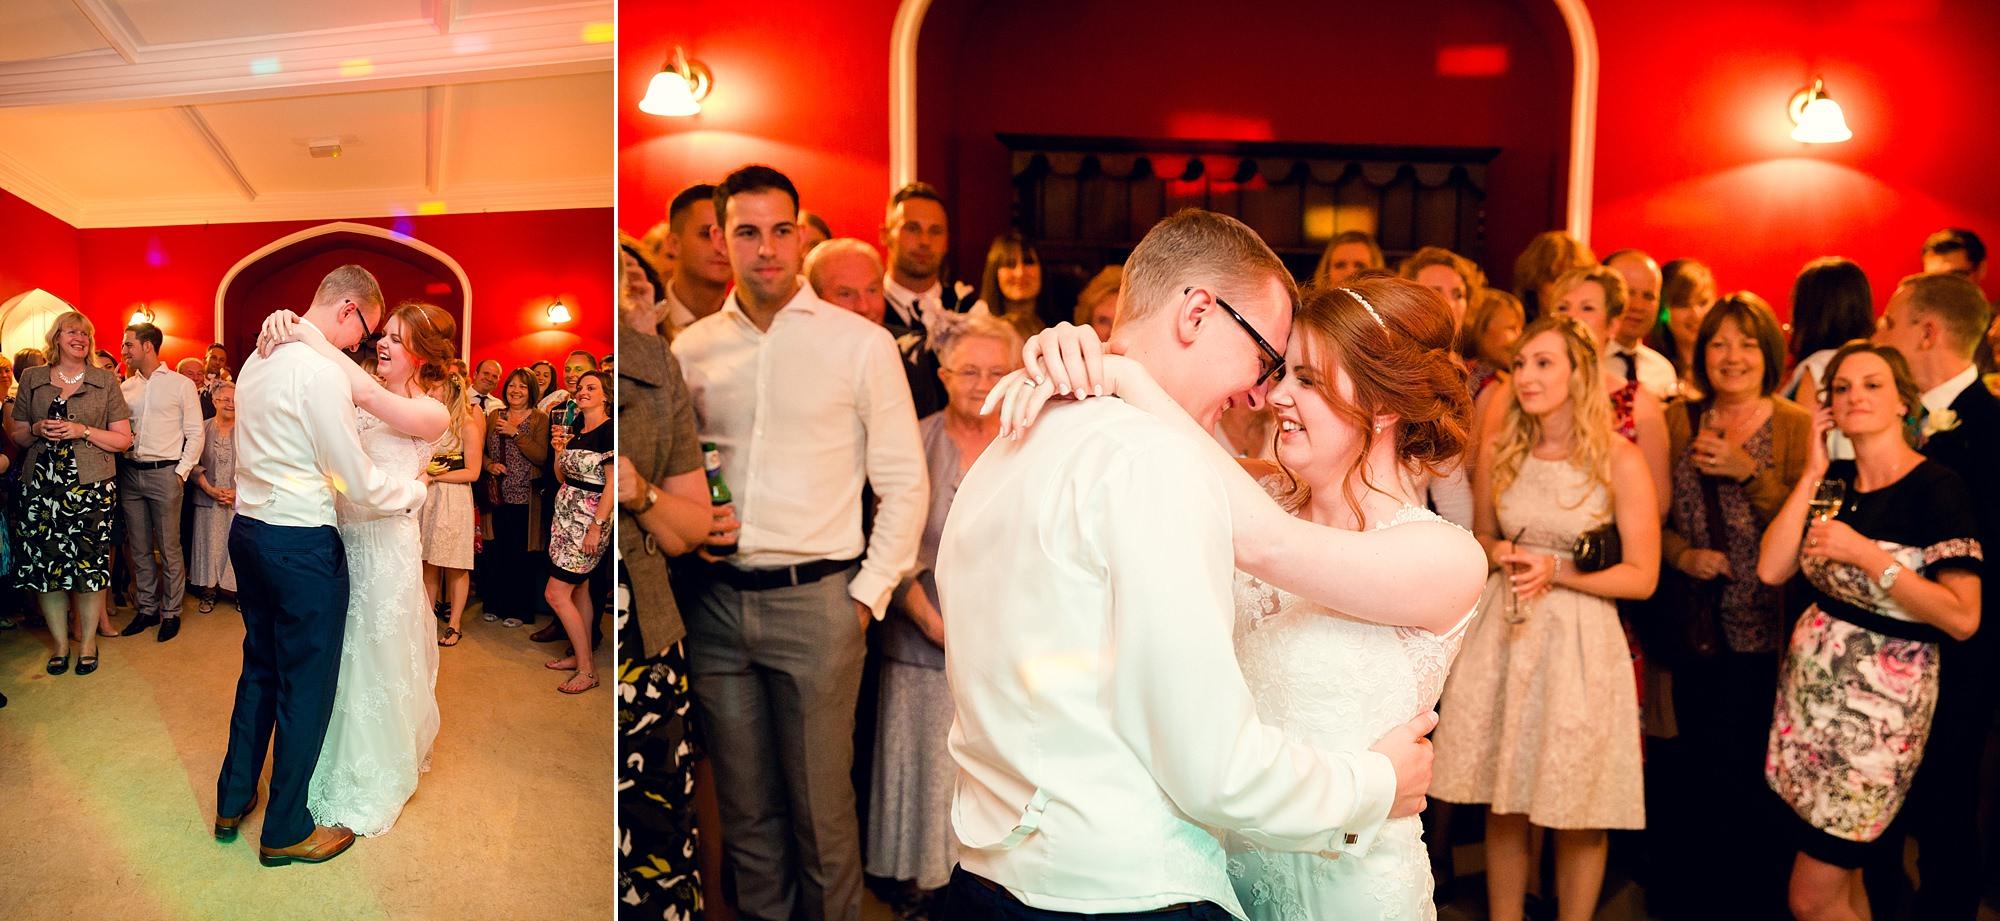 Canon Lane Chichester wedding first dance